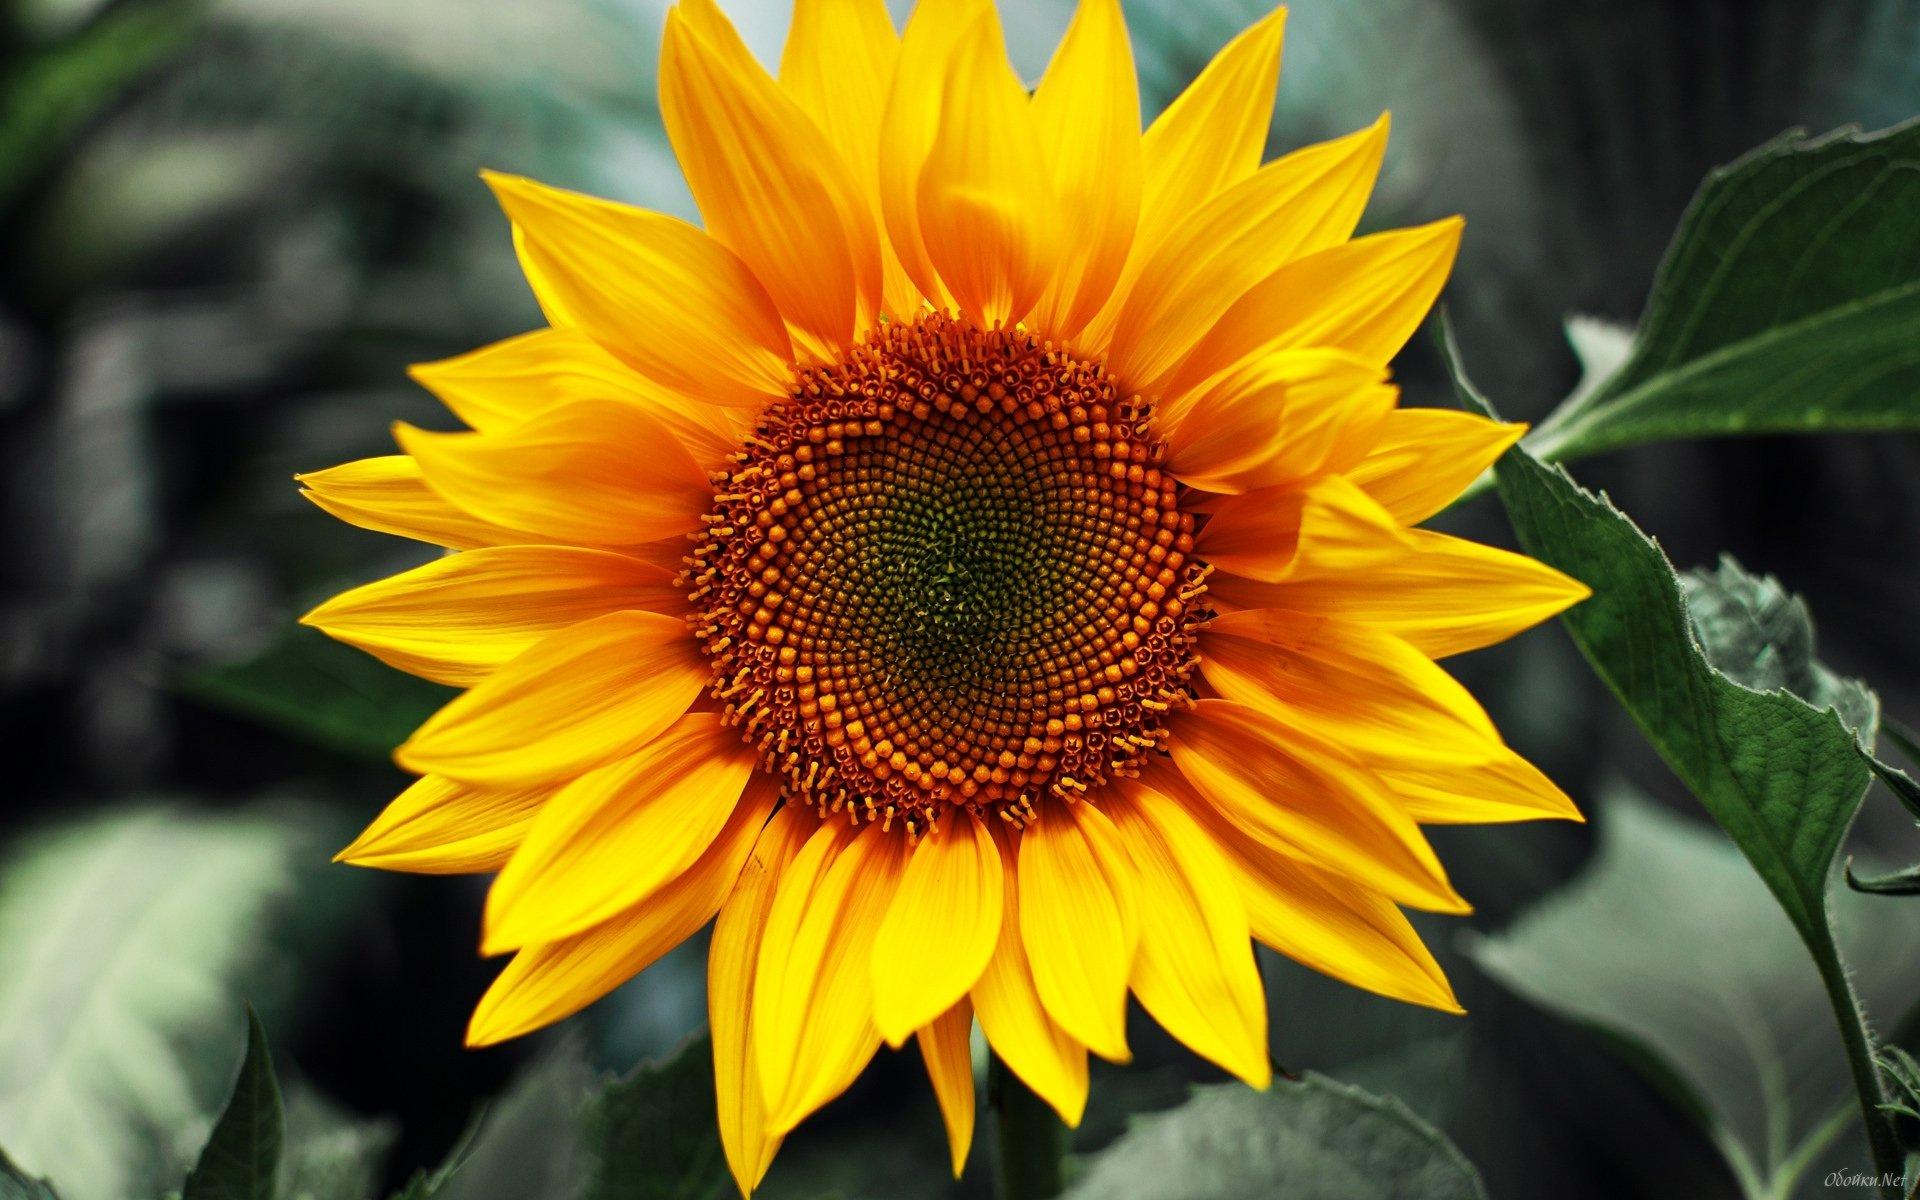 43+ HD Sunflower Wallpaper on WallpaperSafari